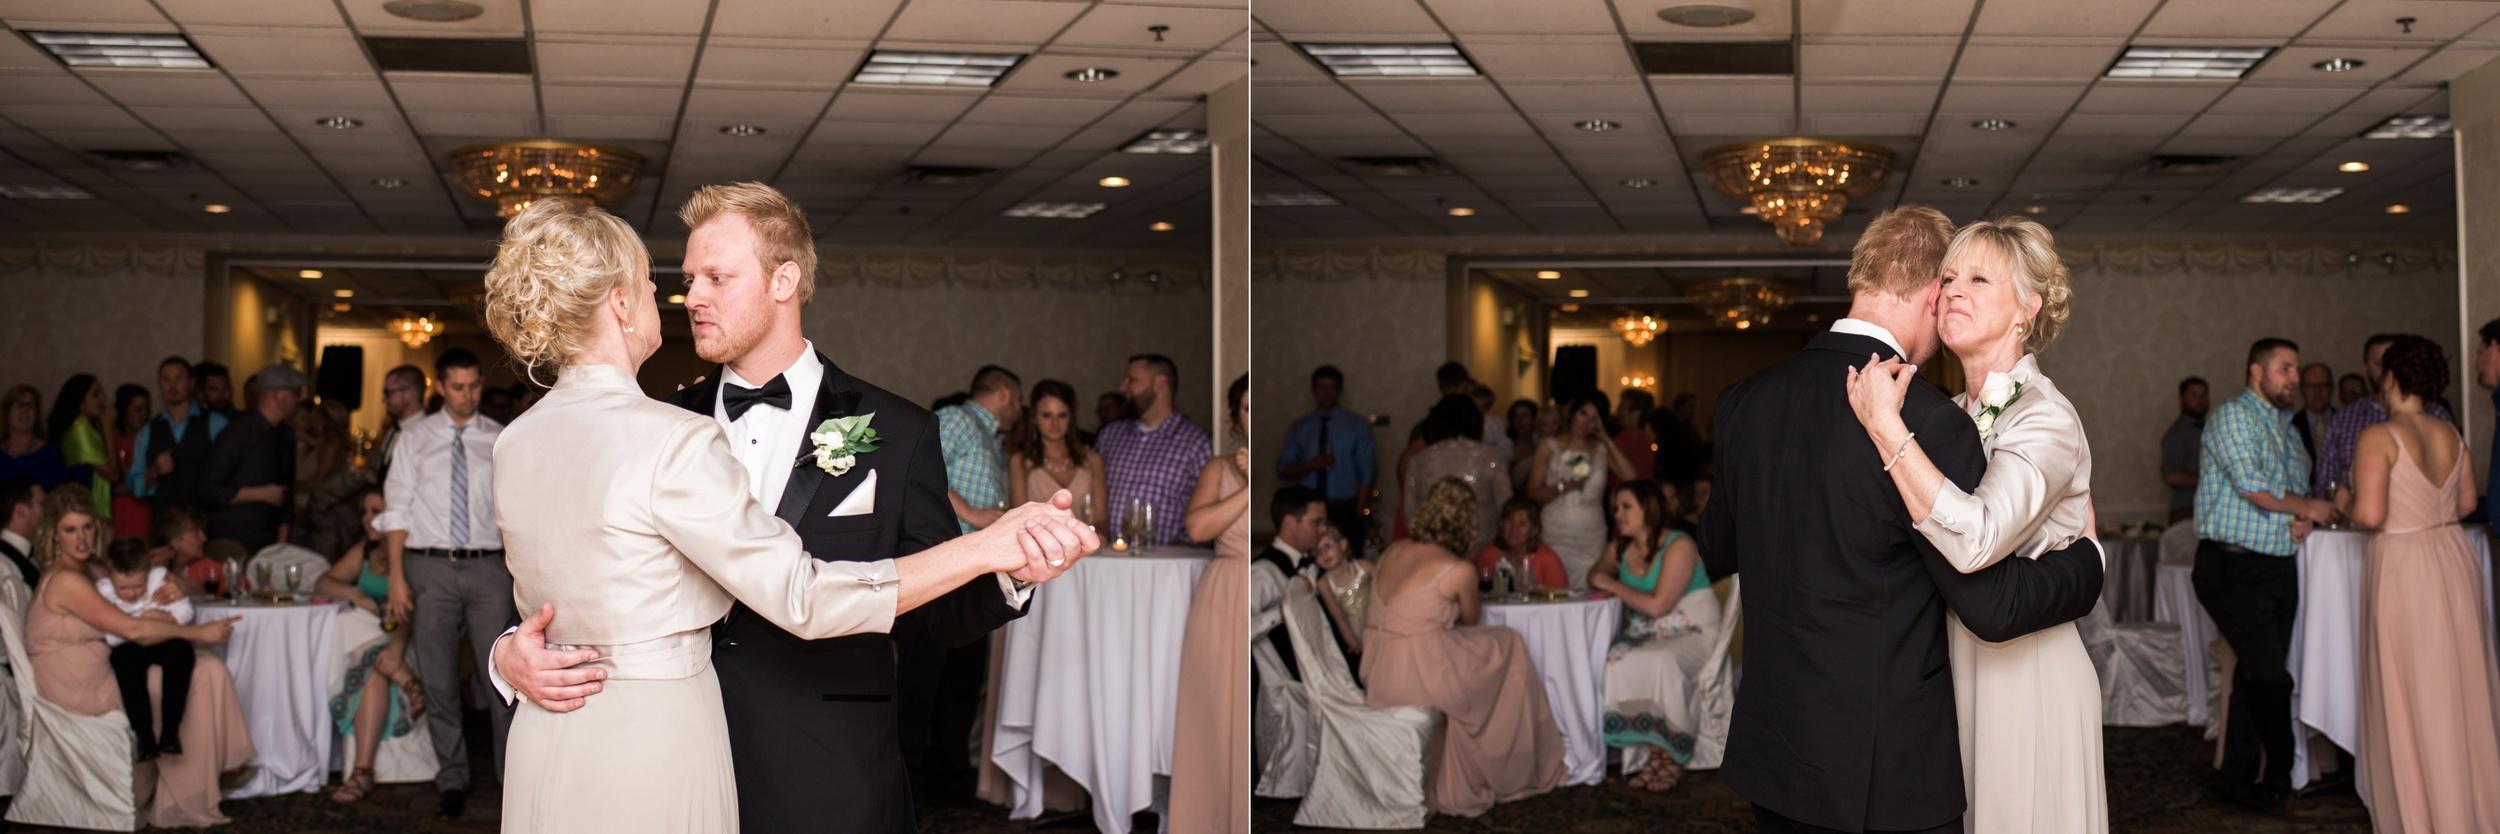 Downtown Des Moines Wedding Photographer_2146.jpg